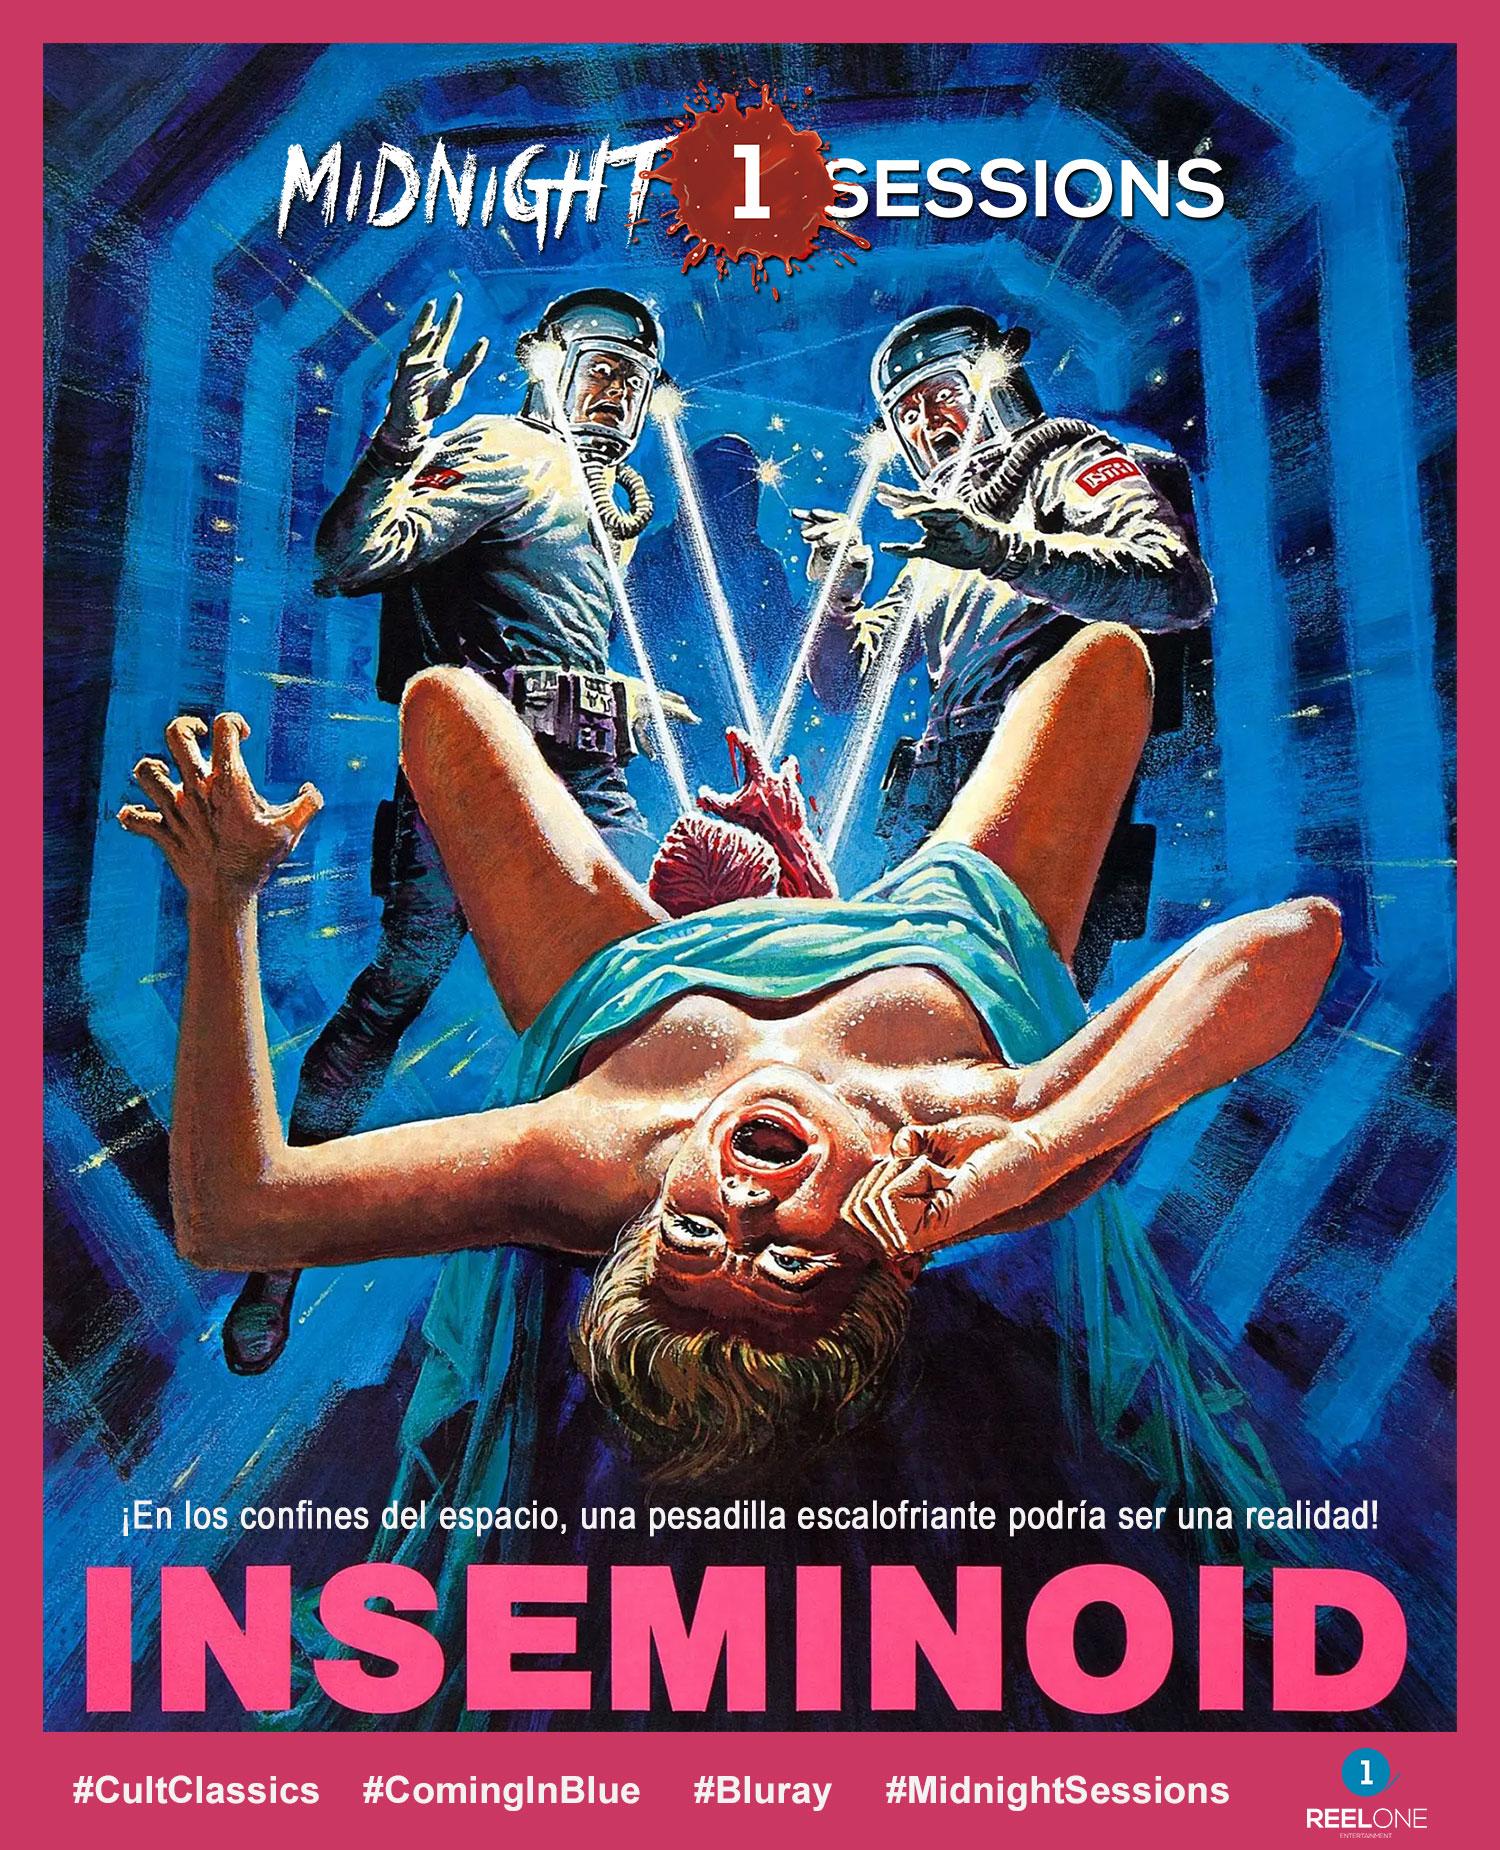 Cartel promocional Midnight Sessions - Inseminoid